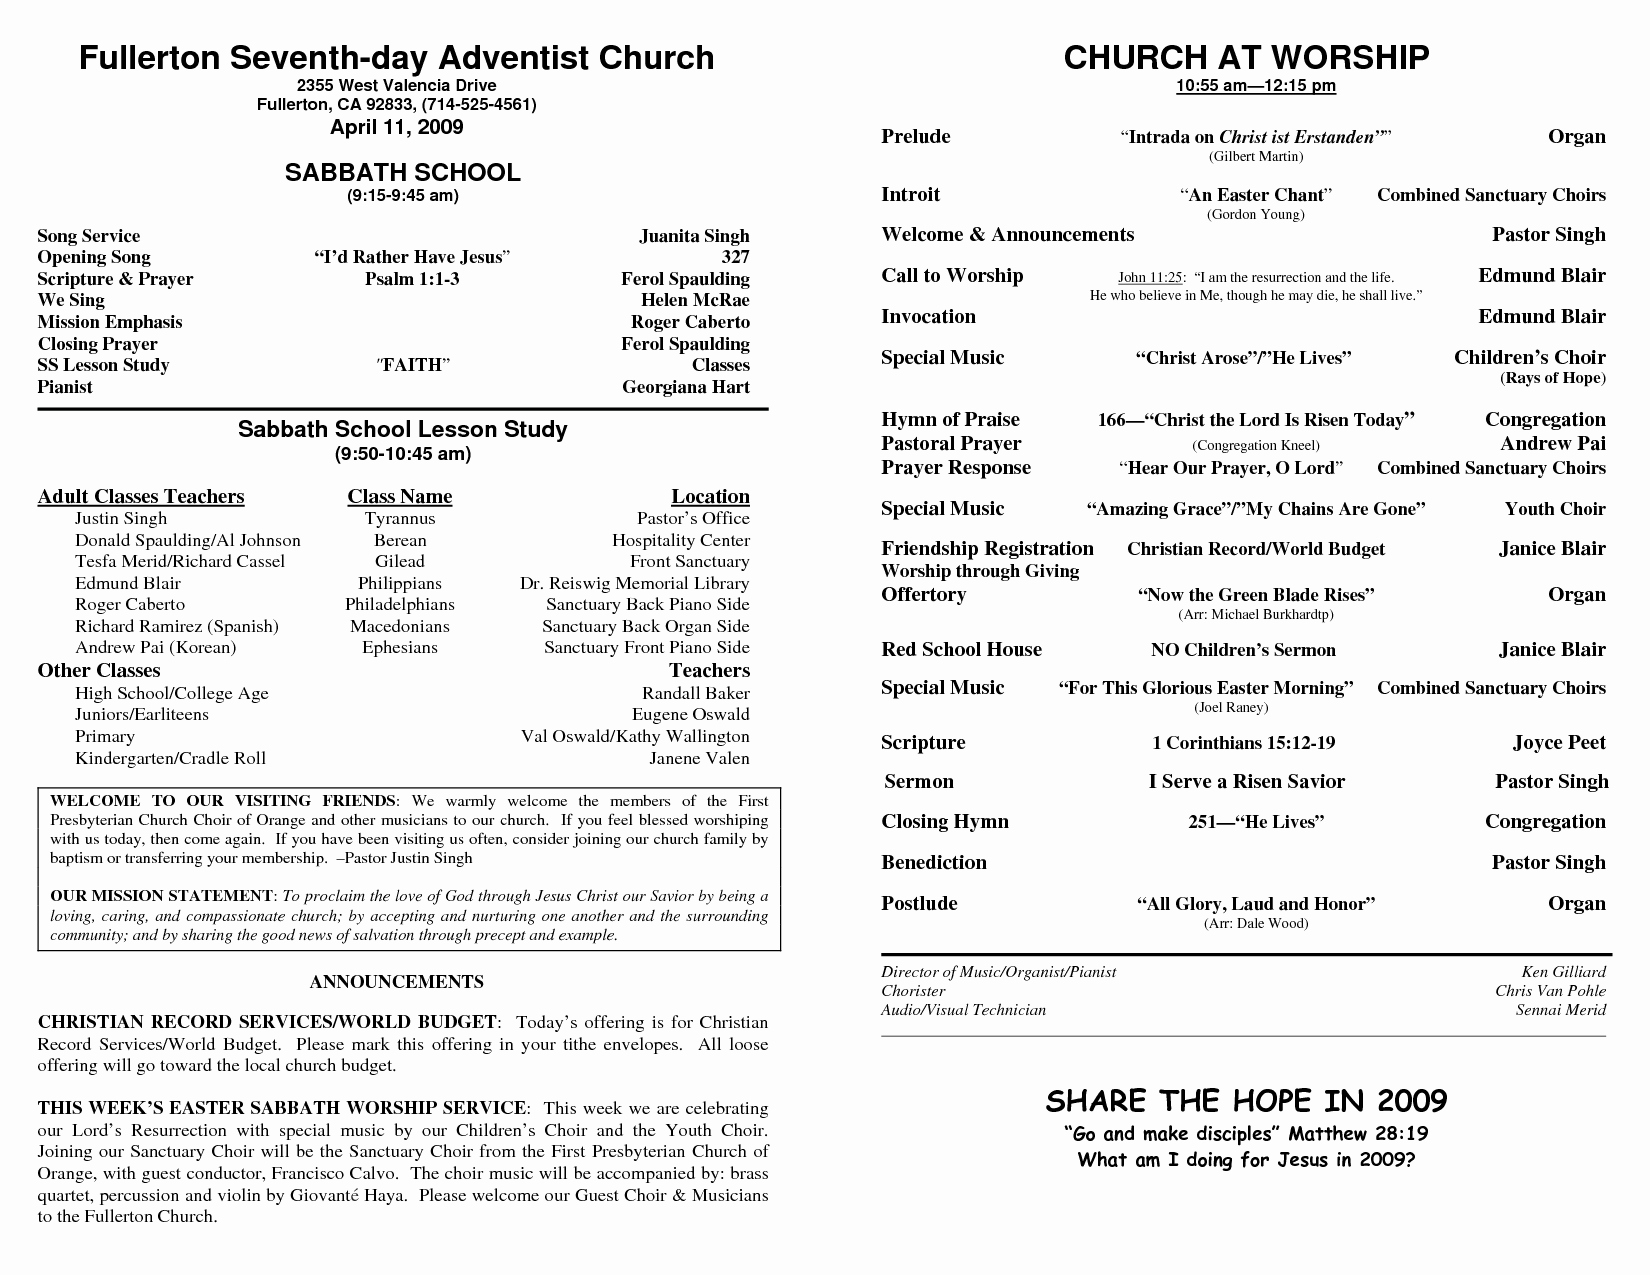 Free Bulletin Template Luxury Church Bulletin Templates